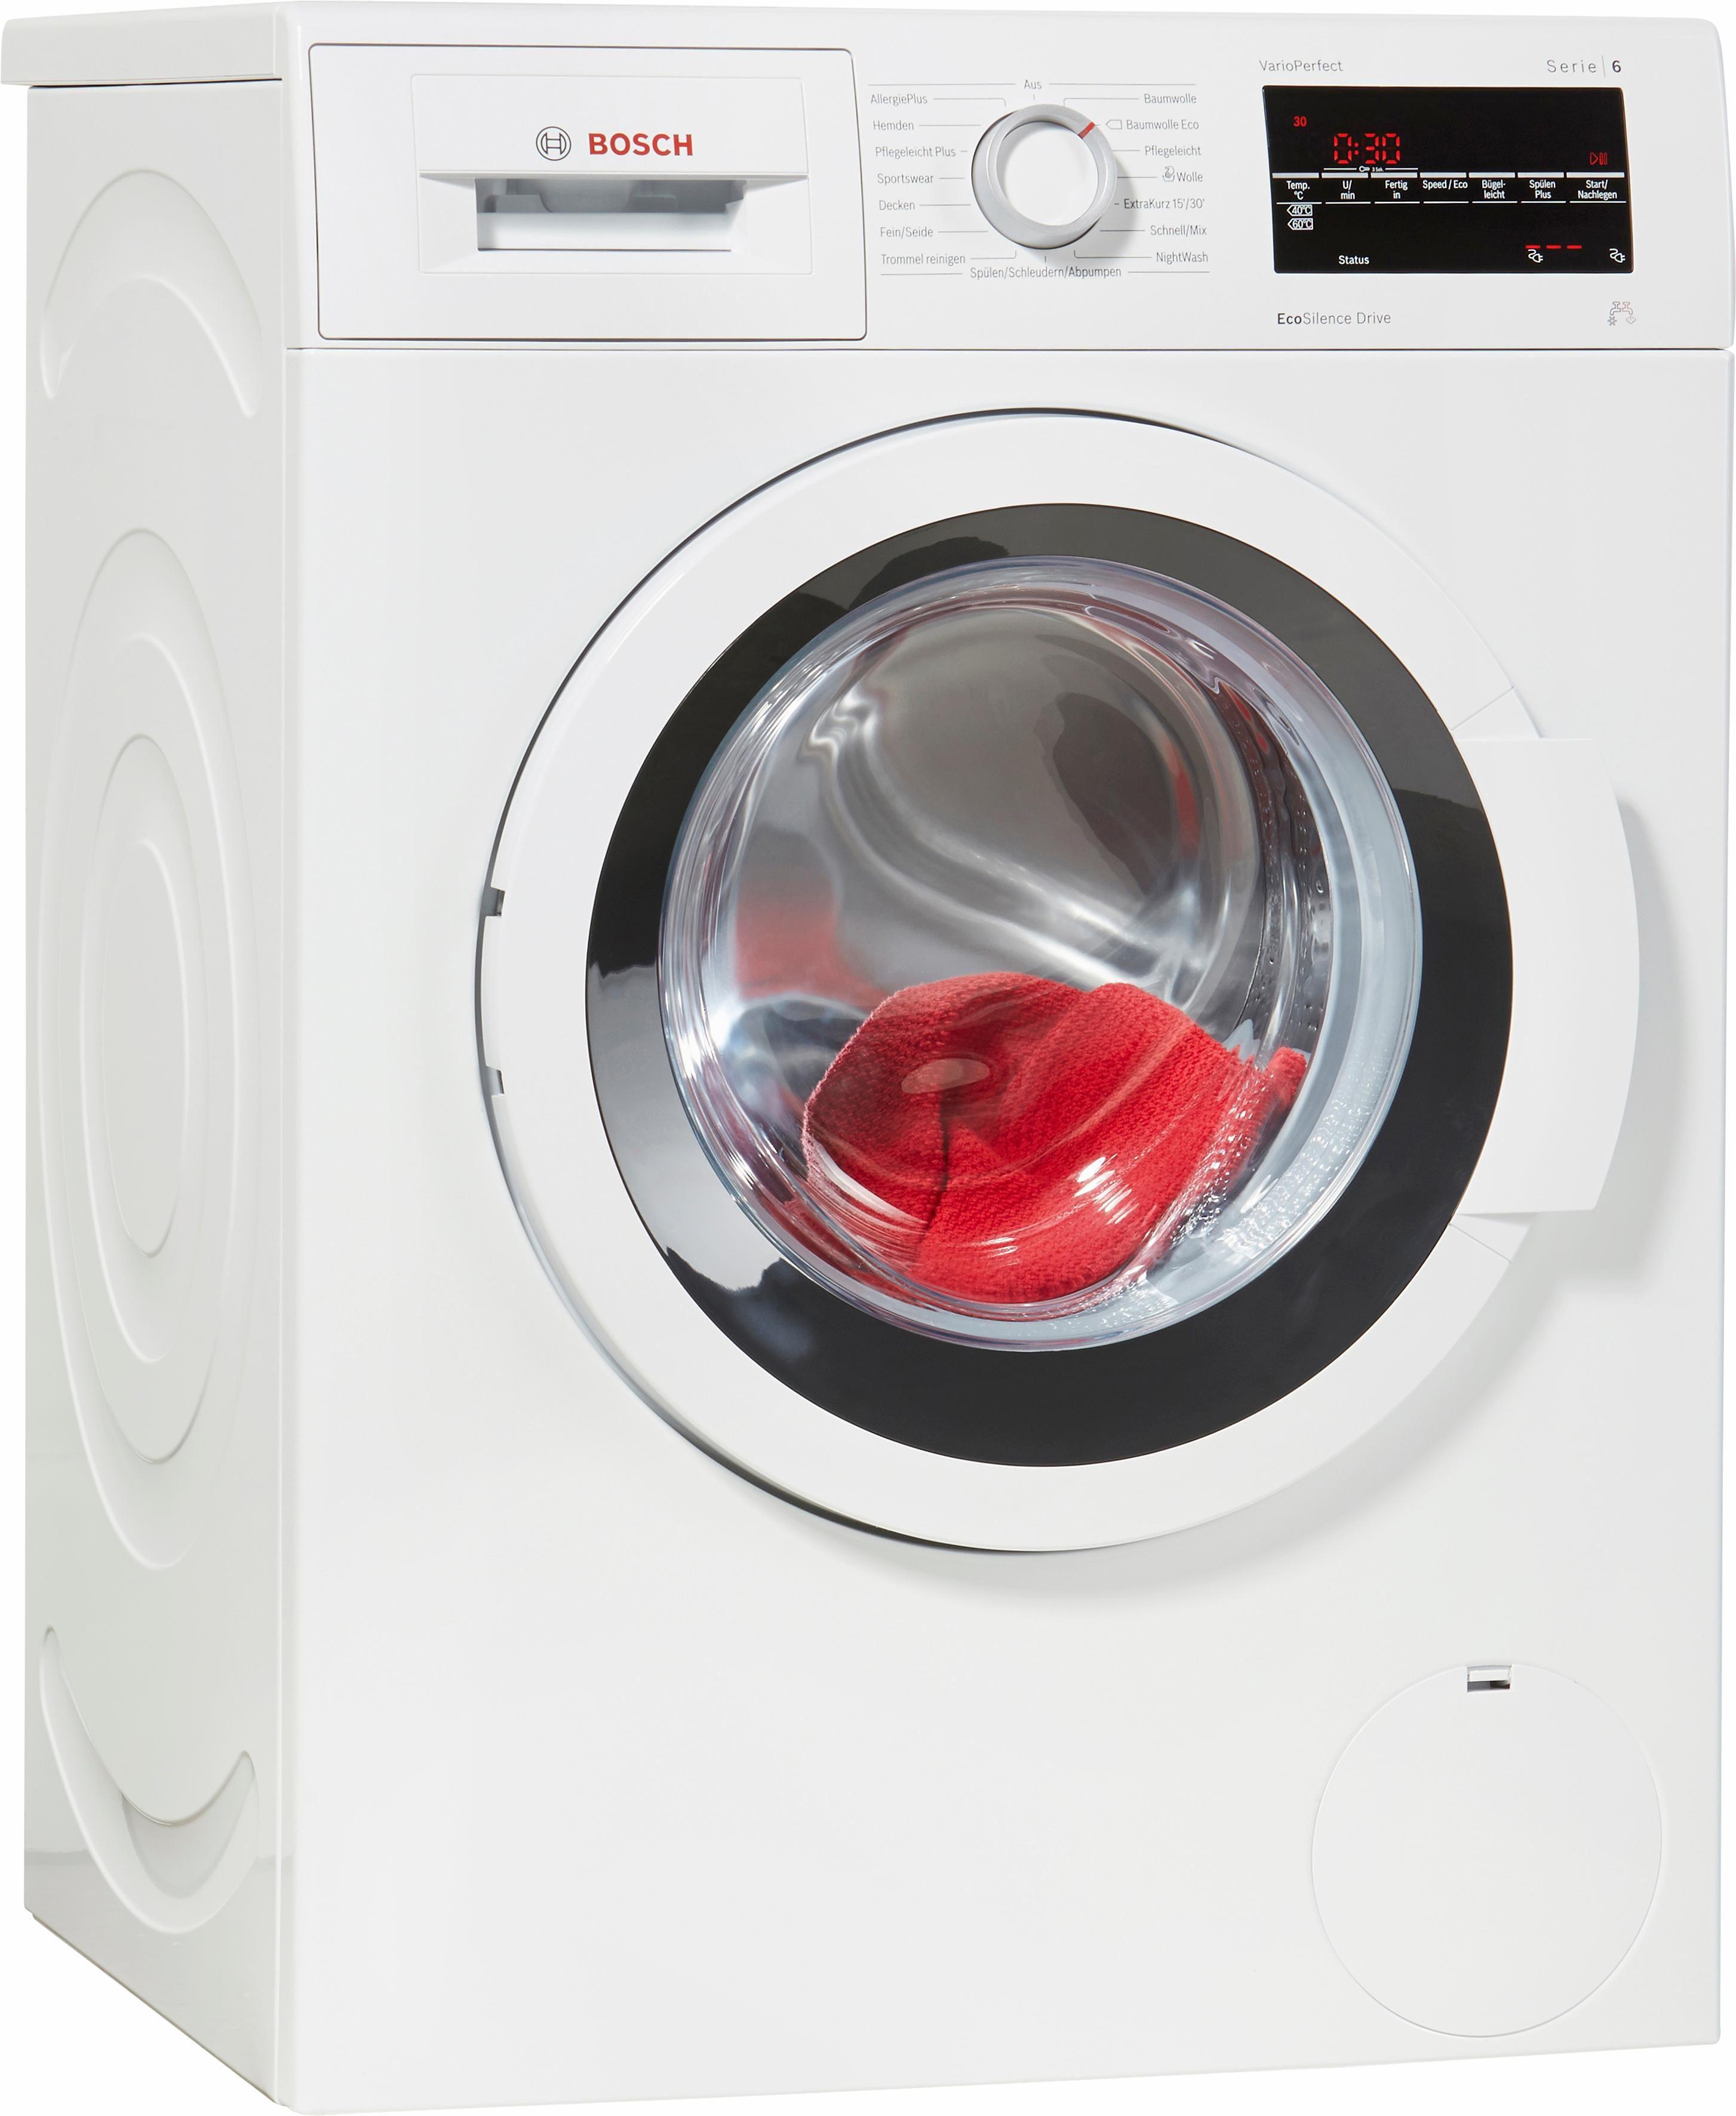 BOSCH Waschmaschine Serie 6 WAT28410, 7 kg, 1400 U/Min